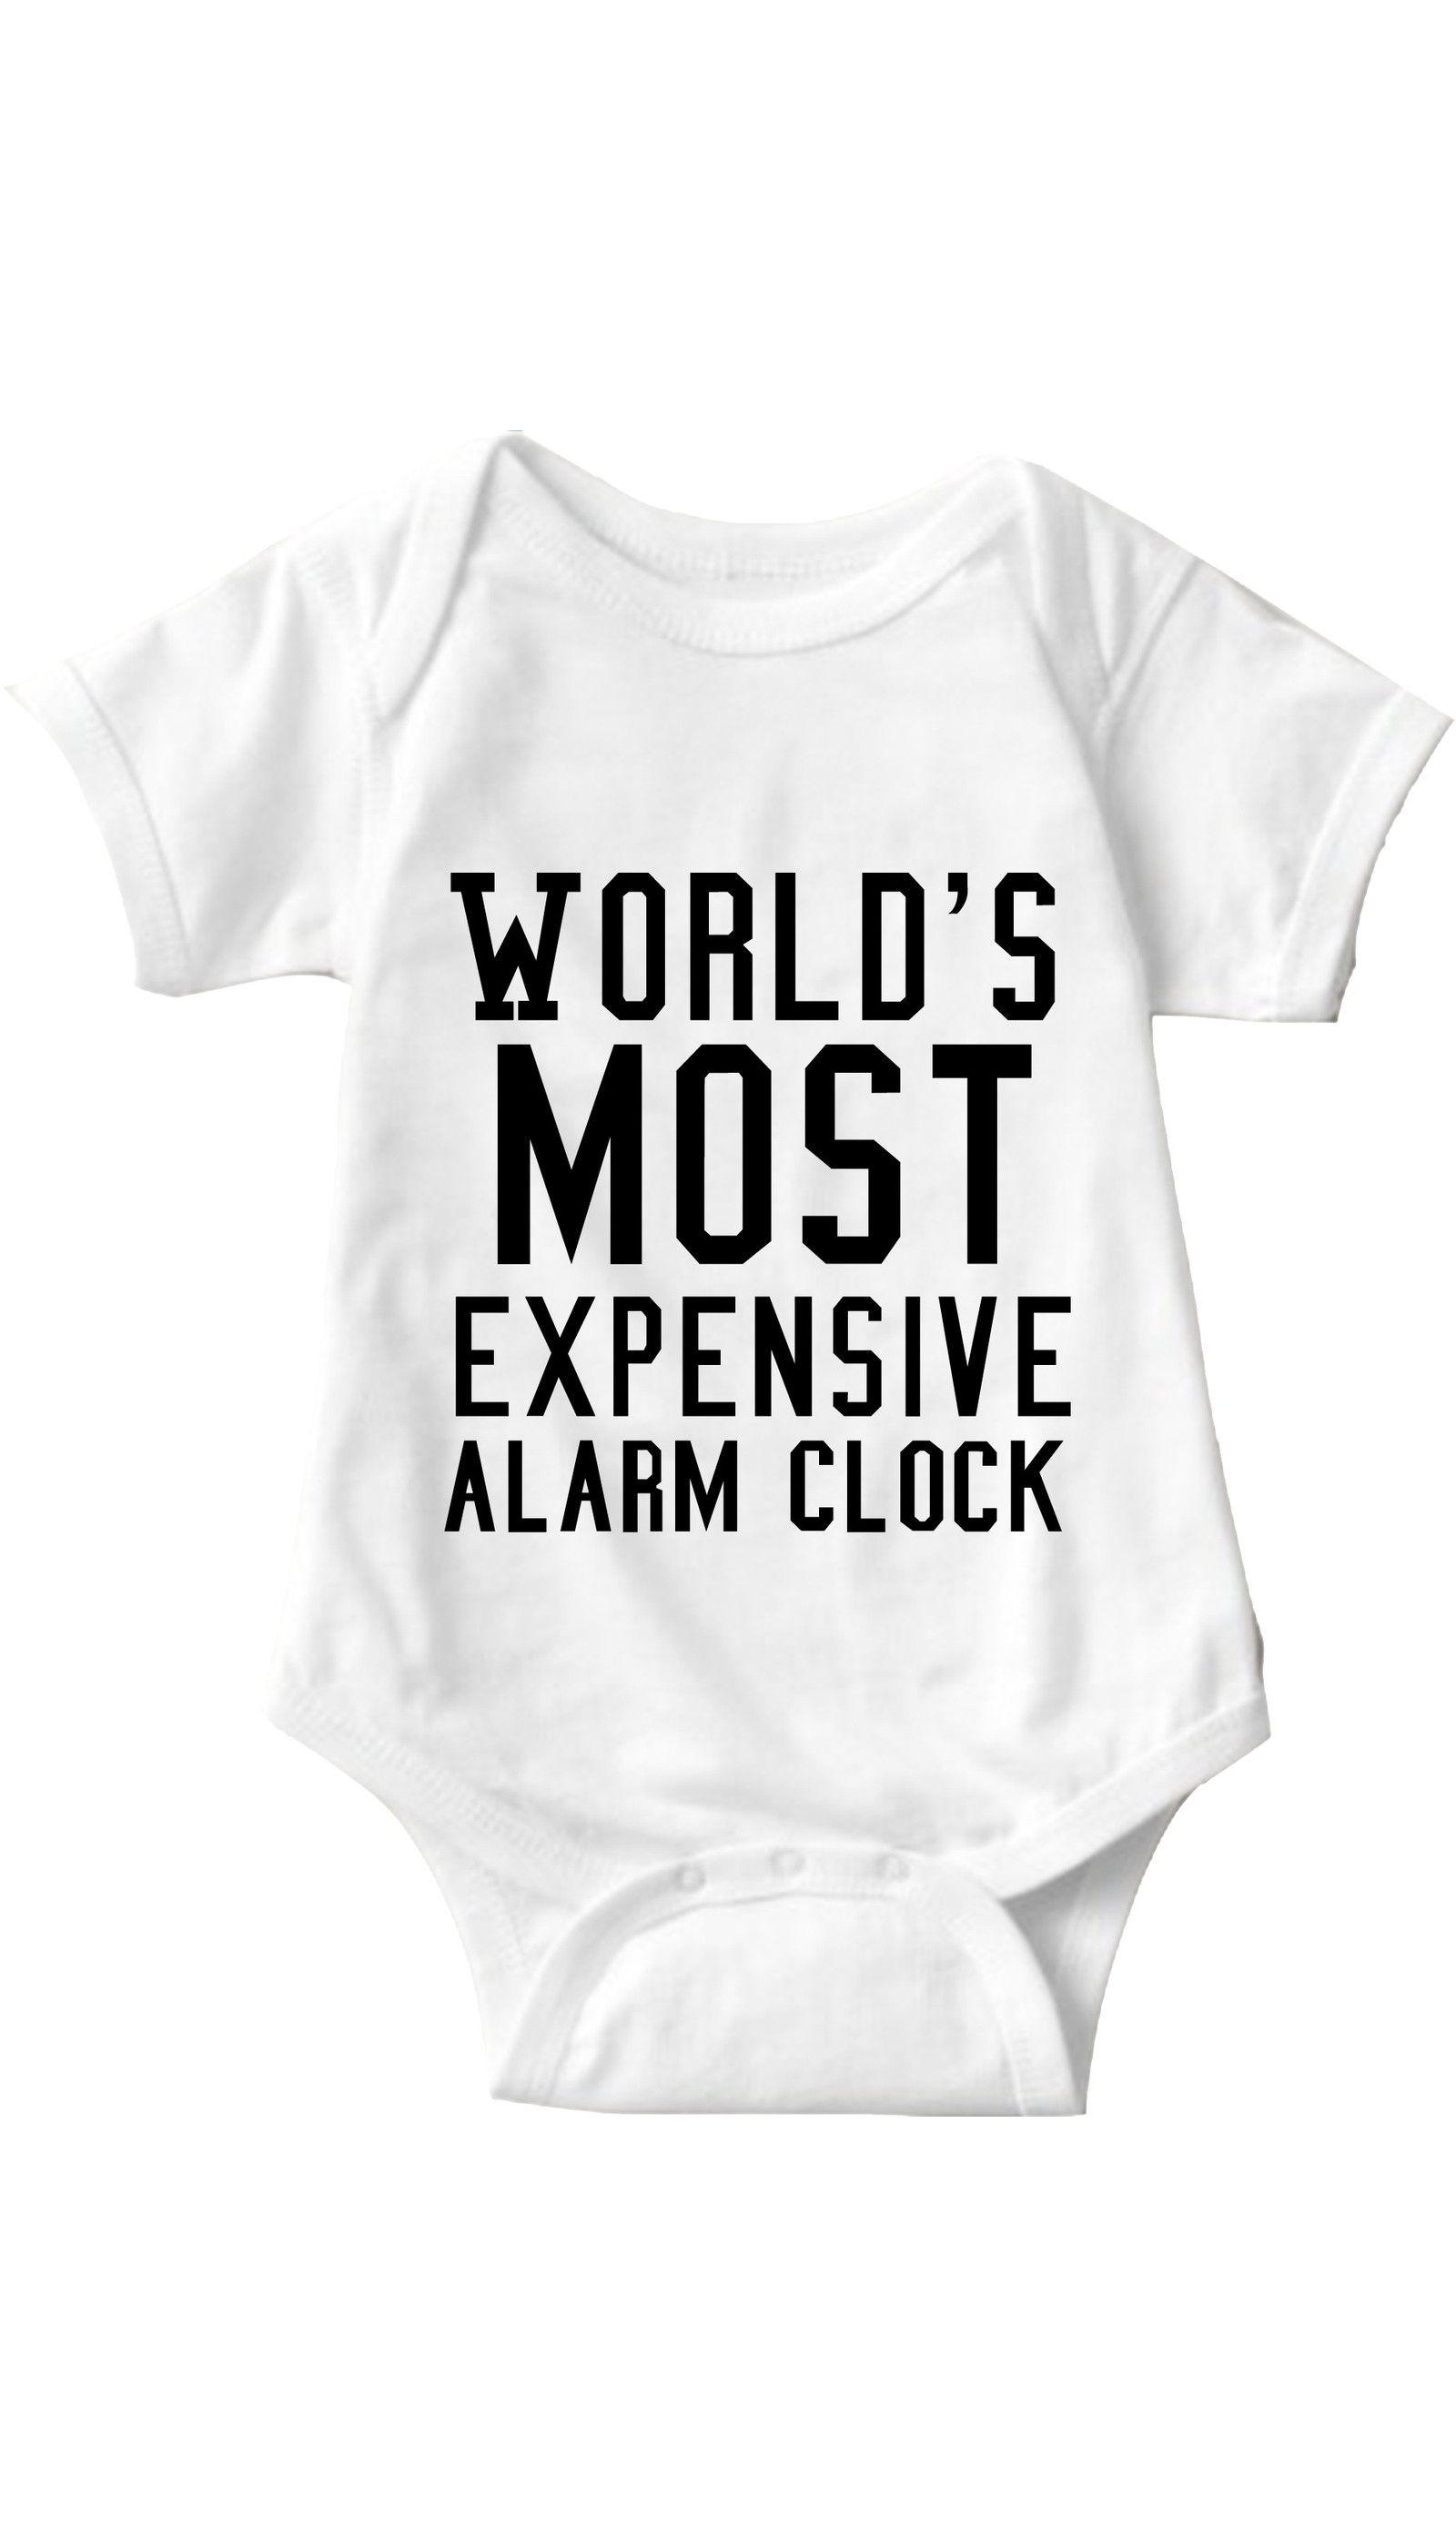 18db096ea World's Most Expensive Alarm Clock White Infant Onesie | Sarcastic ME